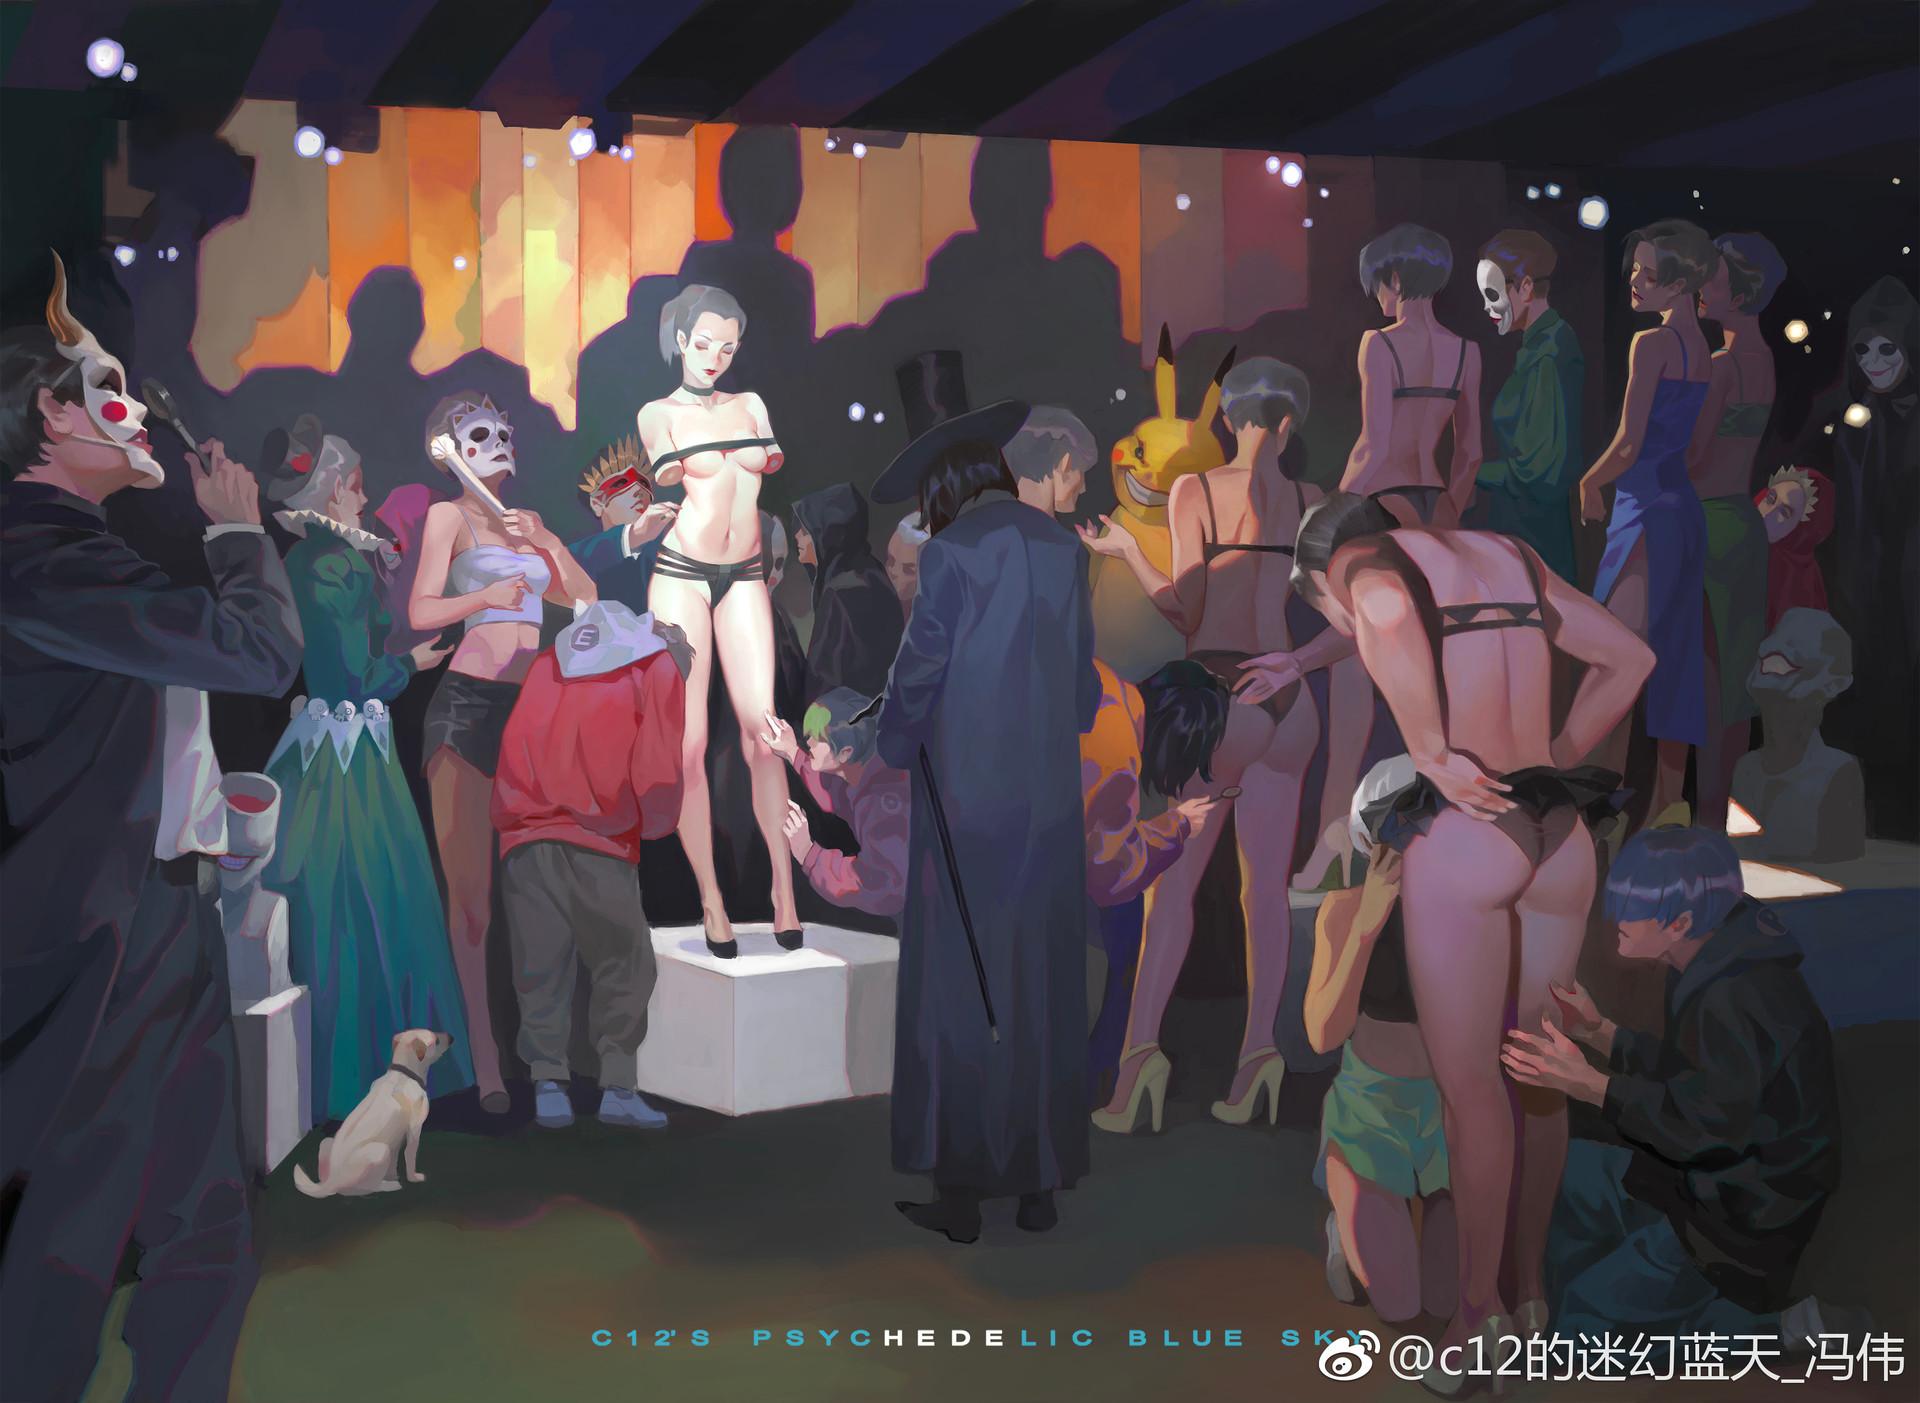 Wei feng 1229 1